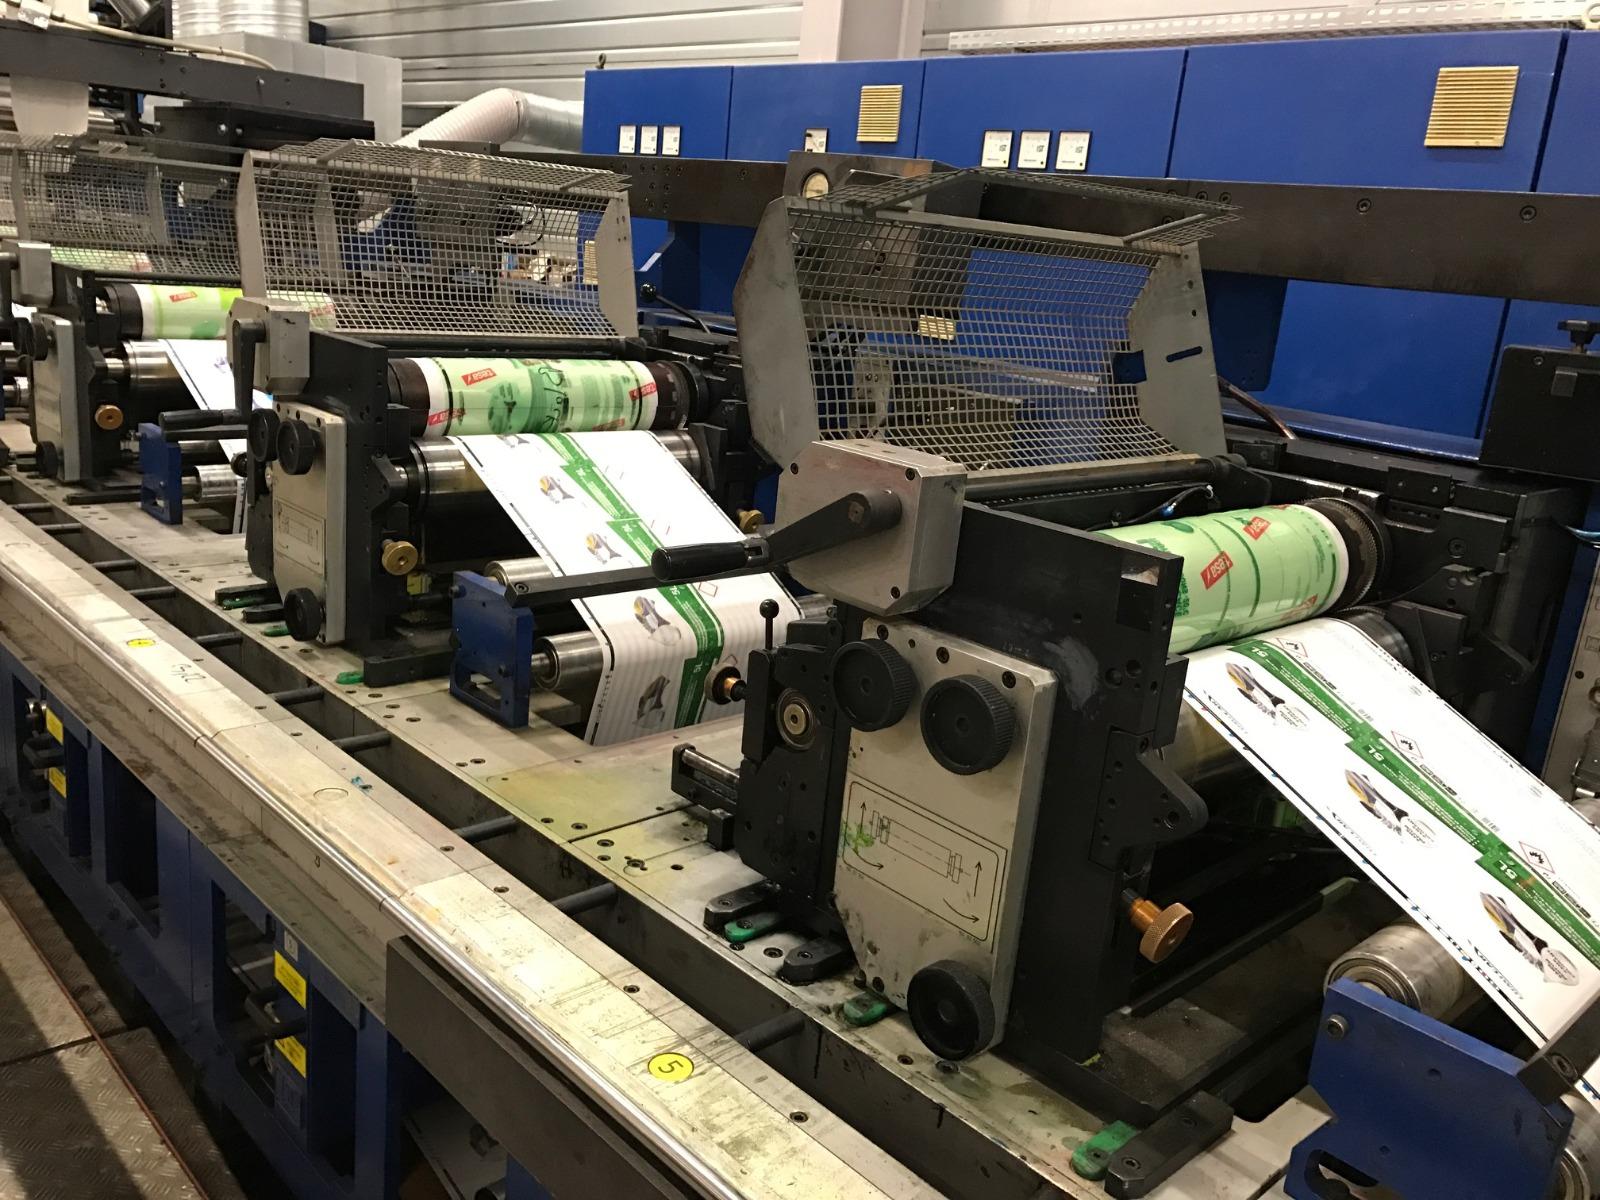 Gallus EM410 - Used Flexo Printing Presses and Used Flexographic Equipment-3